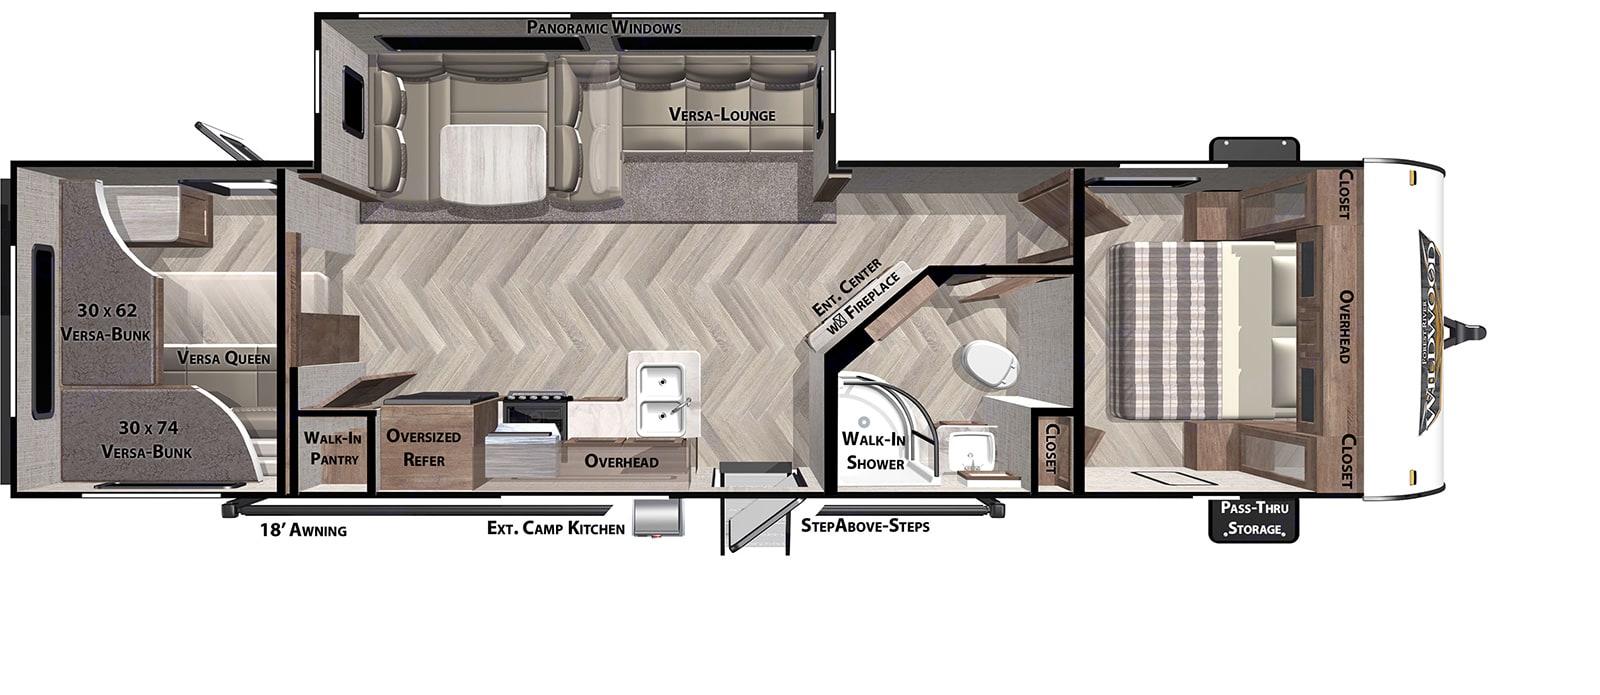 Large space, bunks, and room to make memories.. Wildwood 29VBUD 2021